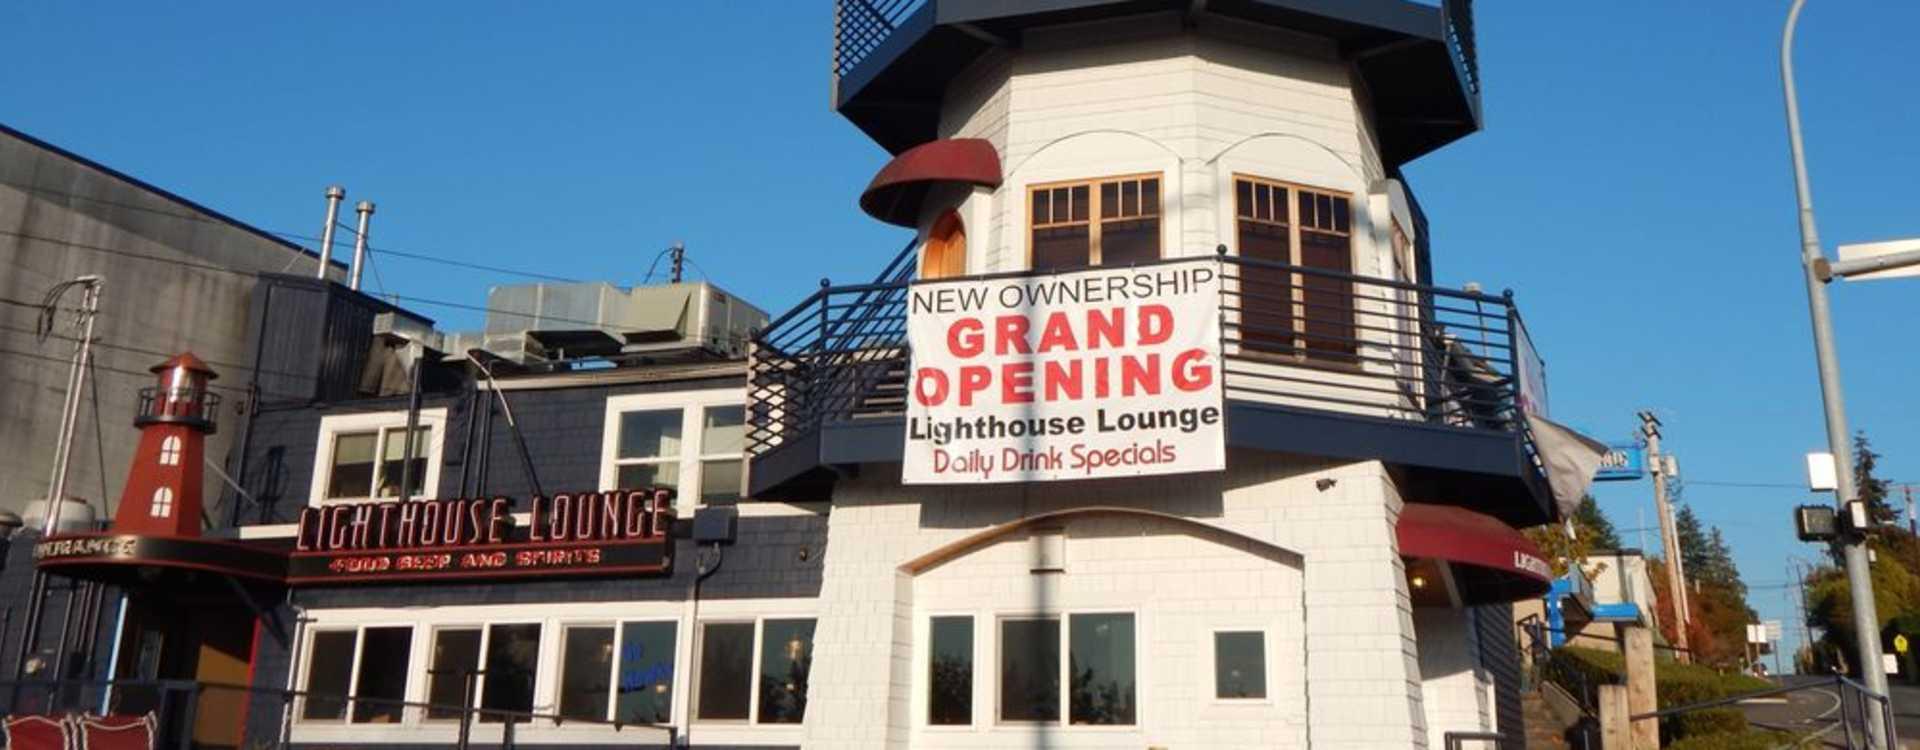 Des Moines Lighthouse Lounge